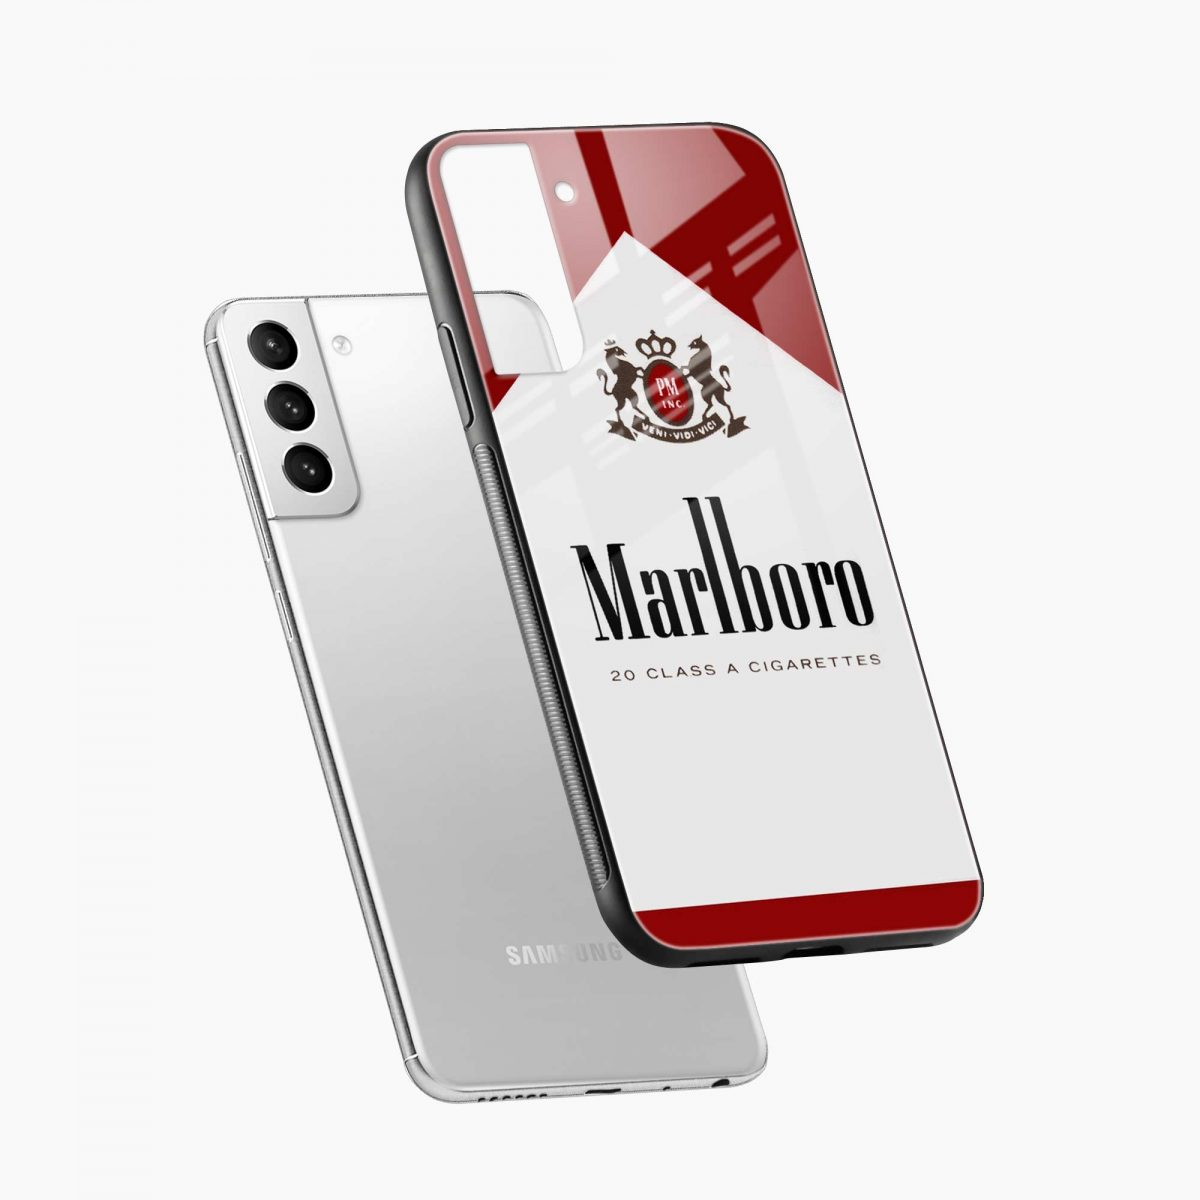 marlboro cigarette box diagonal view samsung s21 plug back cover